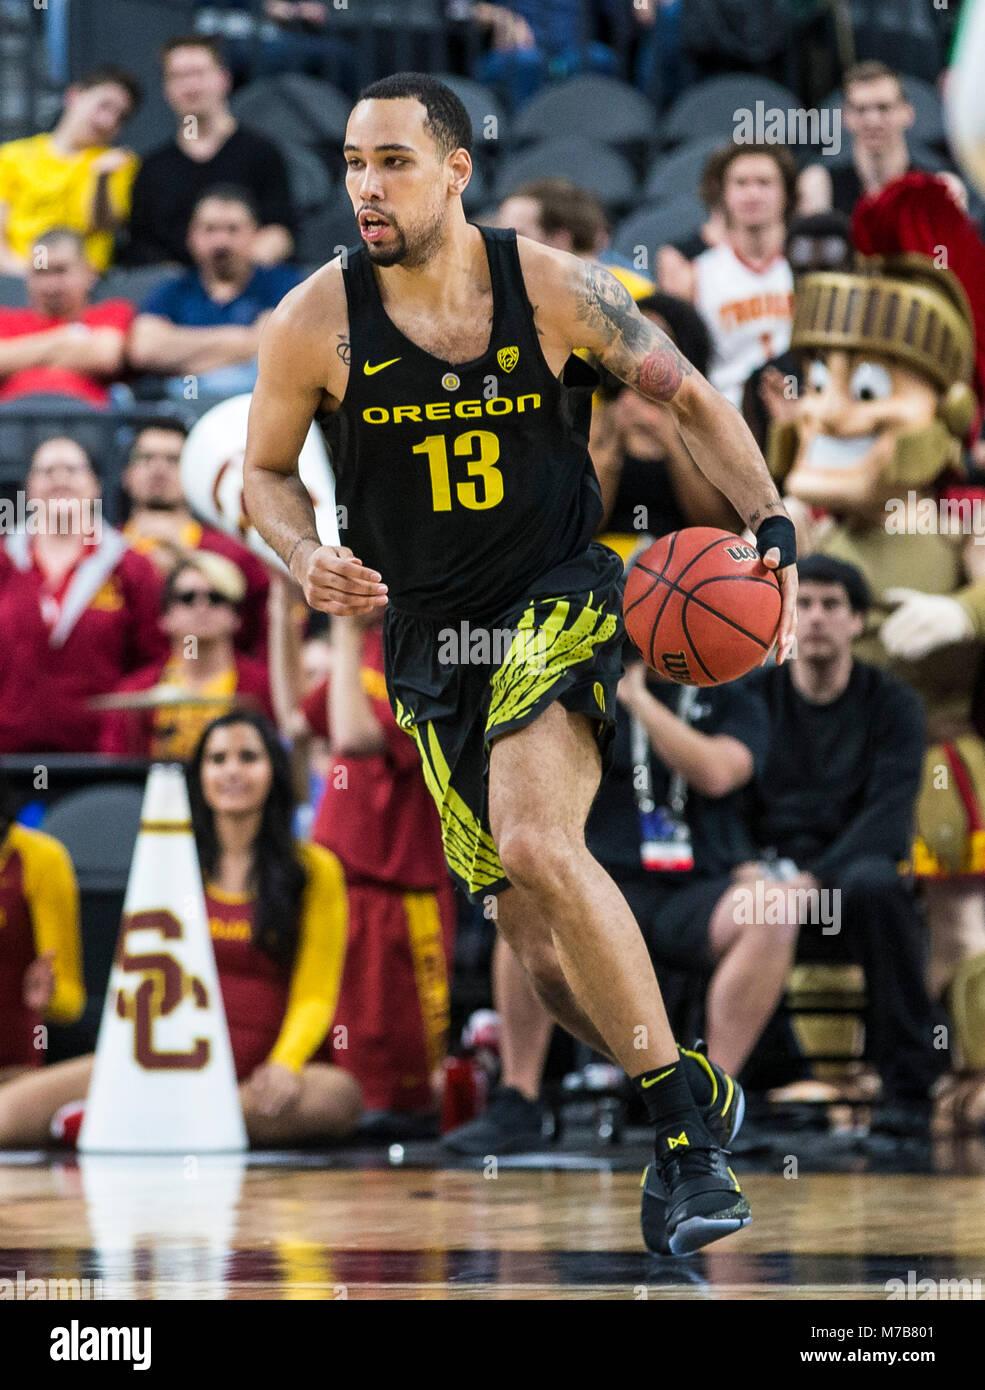 Mar 09 2018 Las Vegas, NV, U.S.A. Oregon forward Paul White (13 Stock Photo: 176654017 - Alamy